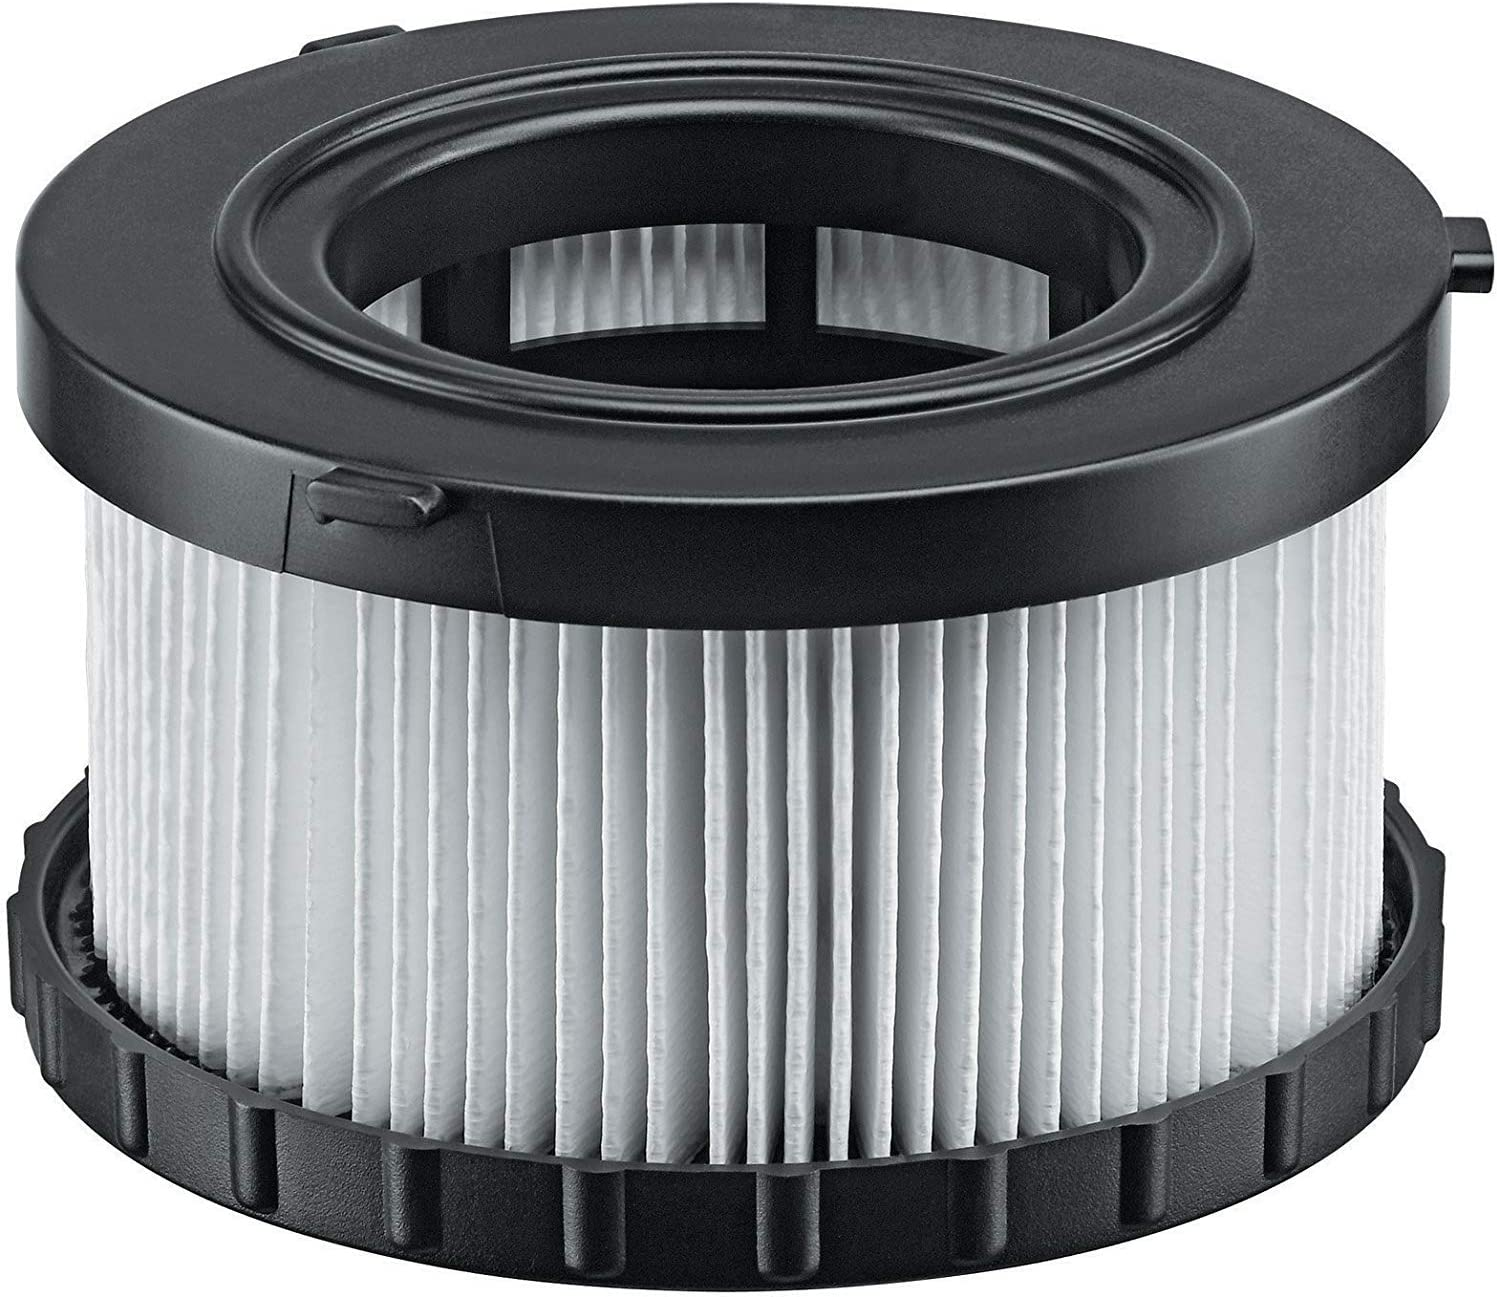 Beemidle DC5151H HEPA Replacement Filter Compatible with DEWALT DC5151H DC515 Replacement HEPA Filter